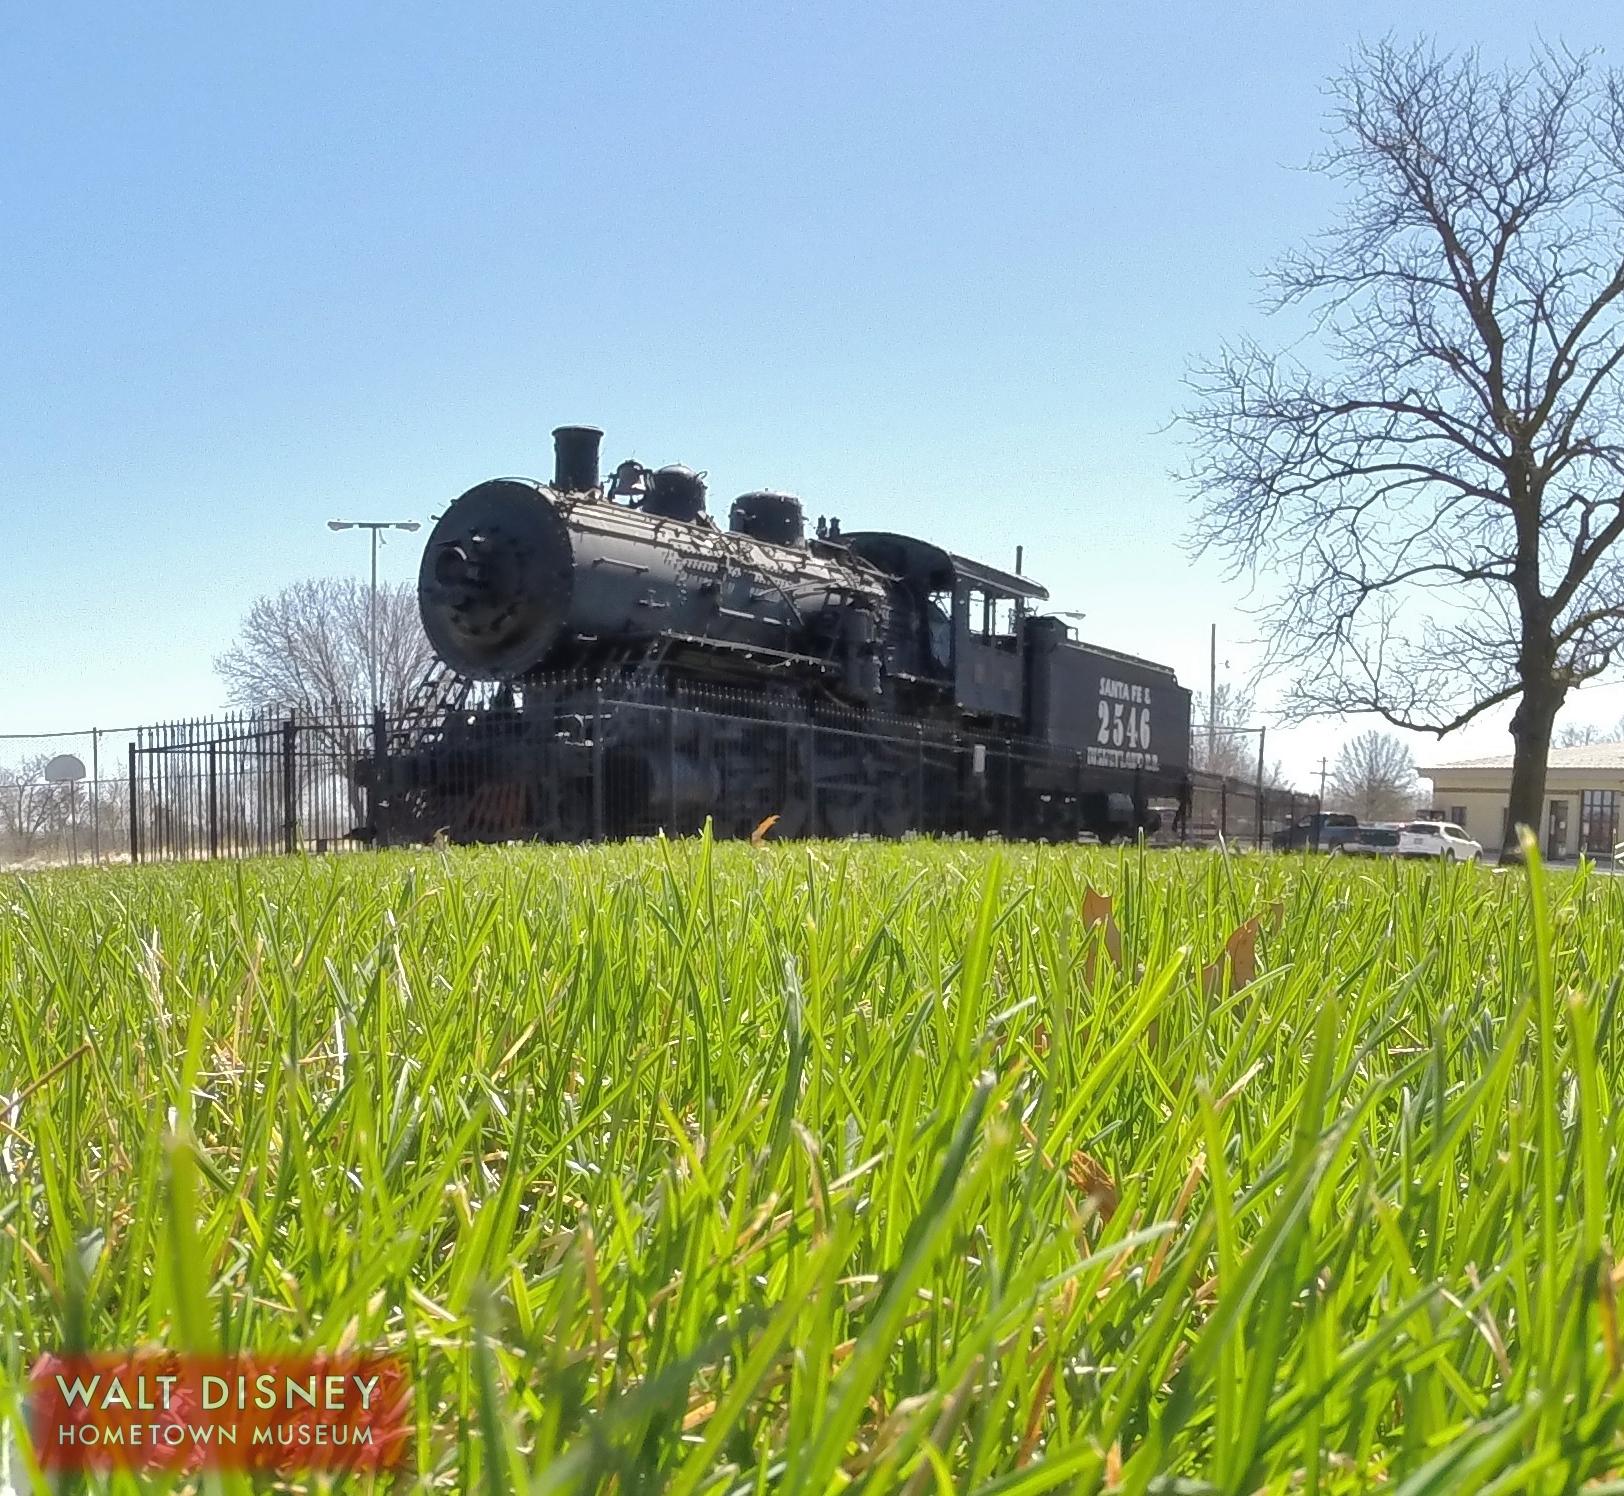 Santa Fe & Disneyland Railroad #2546